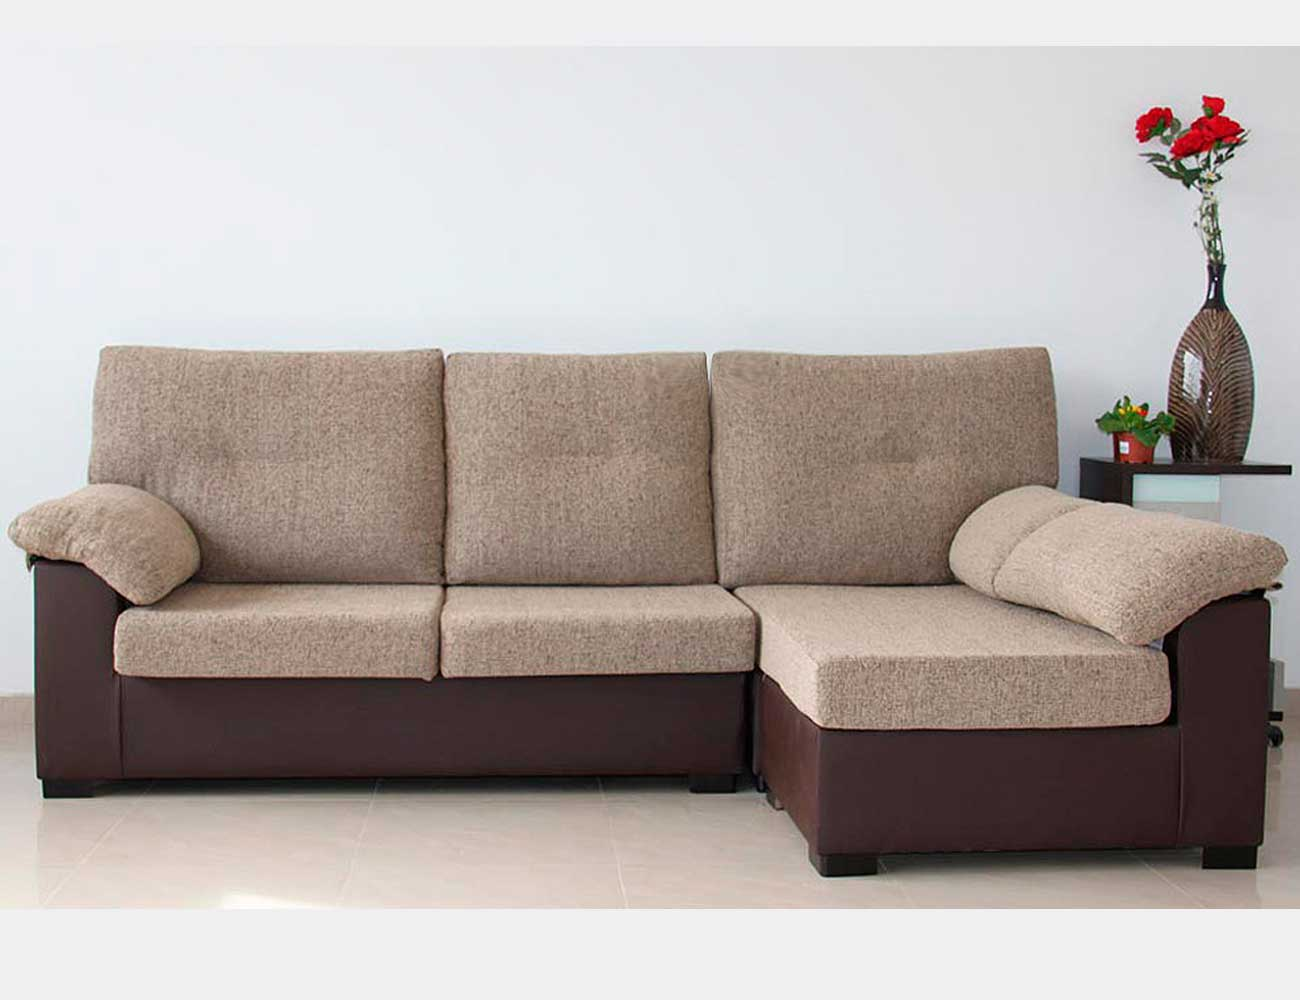 Sofa chaise longue barato3